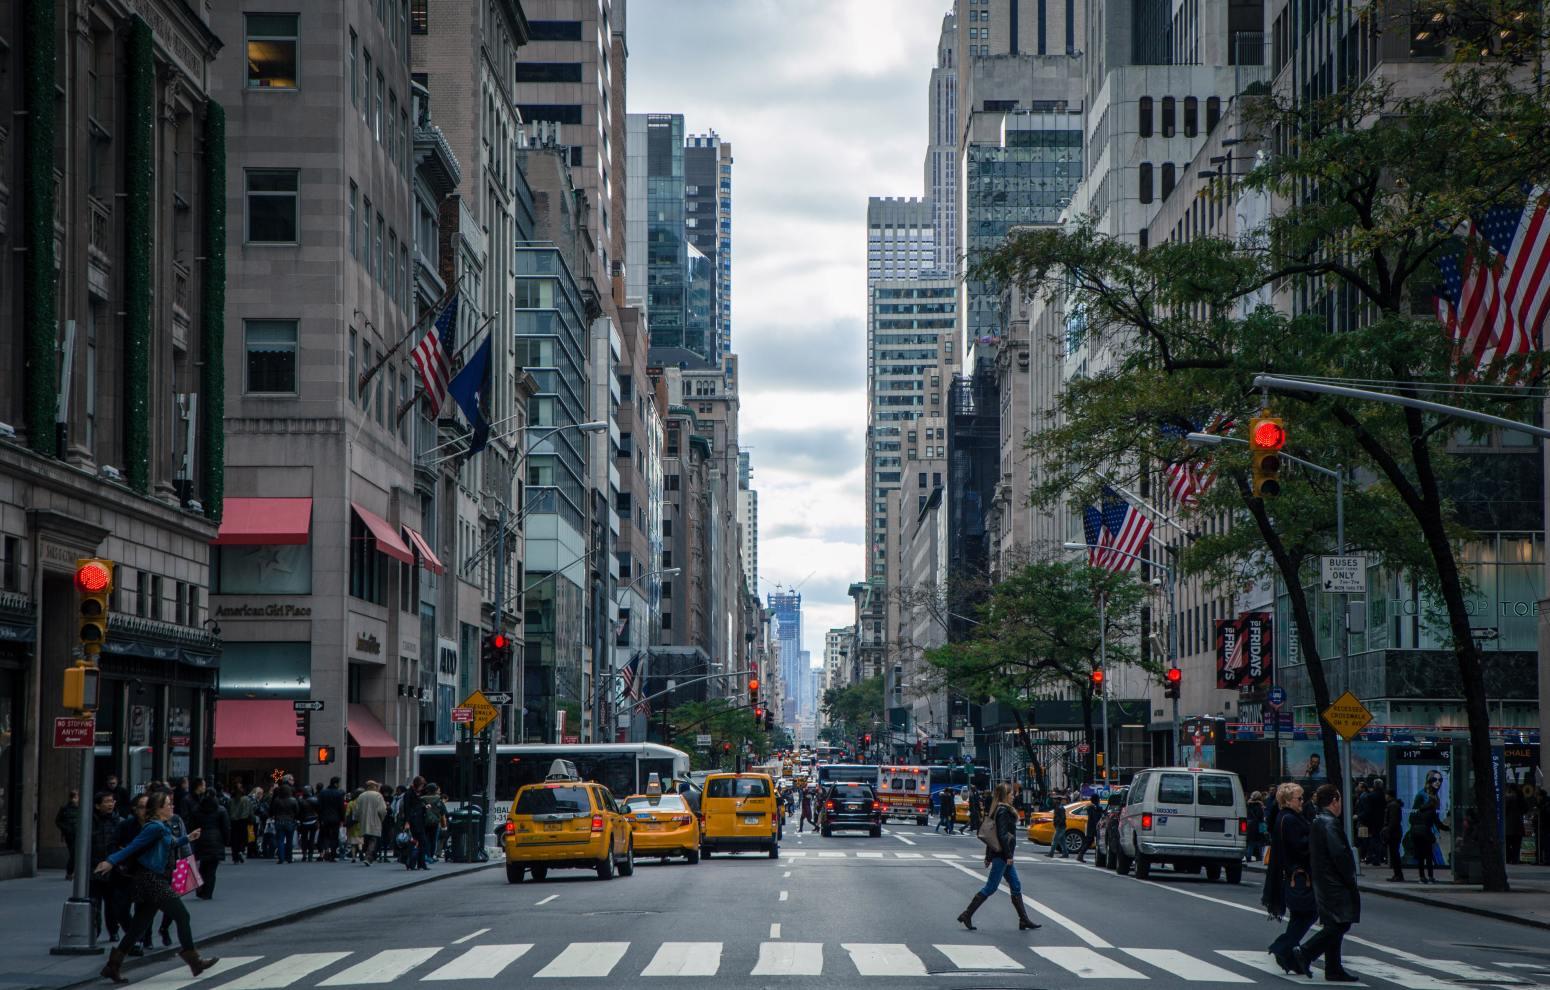 7 Life Lessons I've Learned After Making a Huge Change - Thrive Global